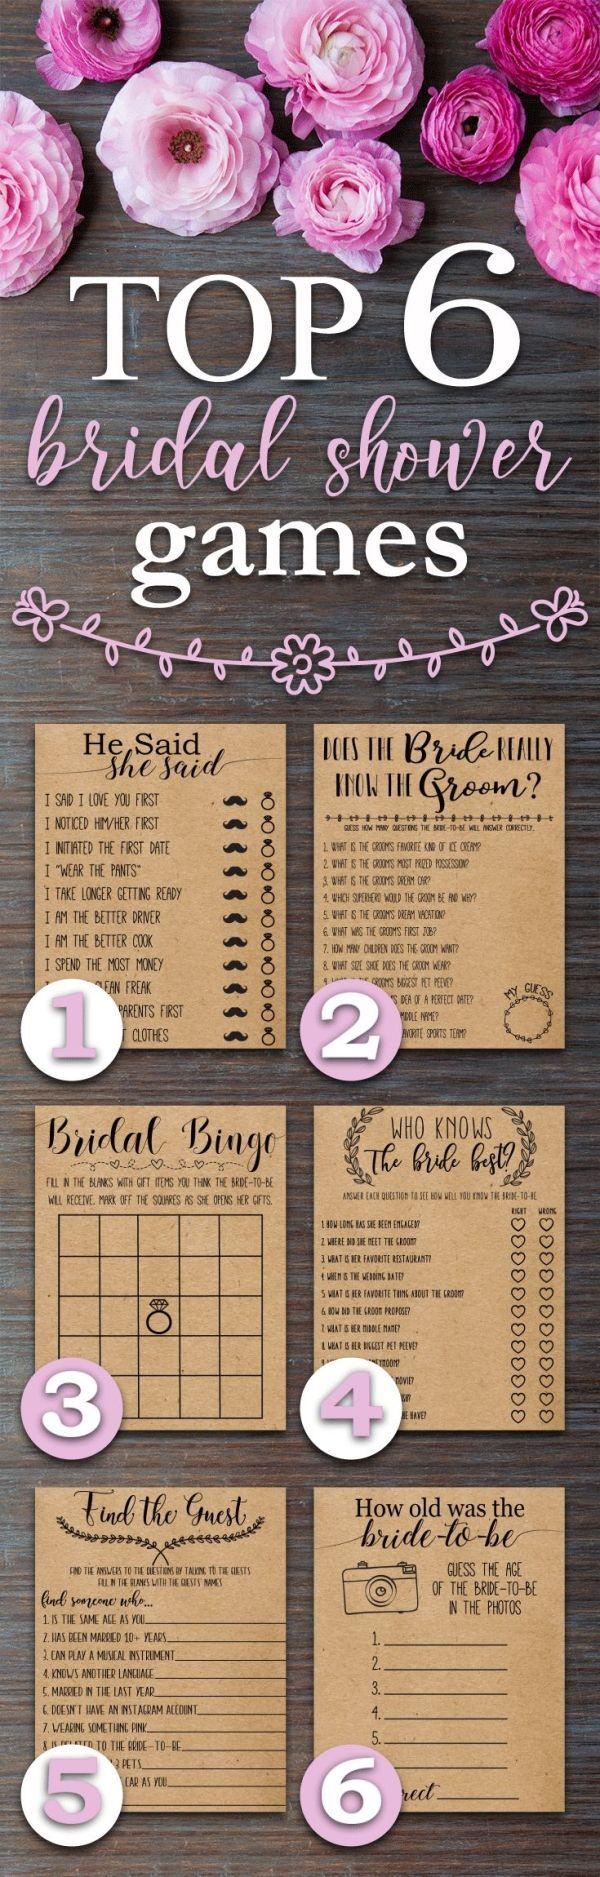 Top 6 Bridal Shower Games. Fun, Rustic, funny, bridal shower games. Perfect for a wedding shower with a country, barn, outdoors, bohemian, rustic theme. by rhea